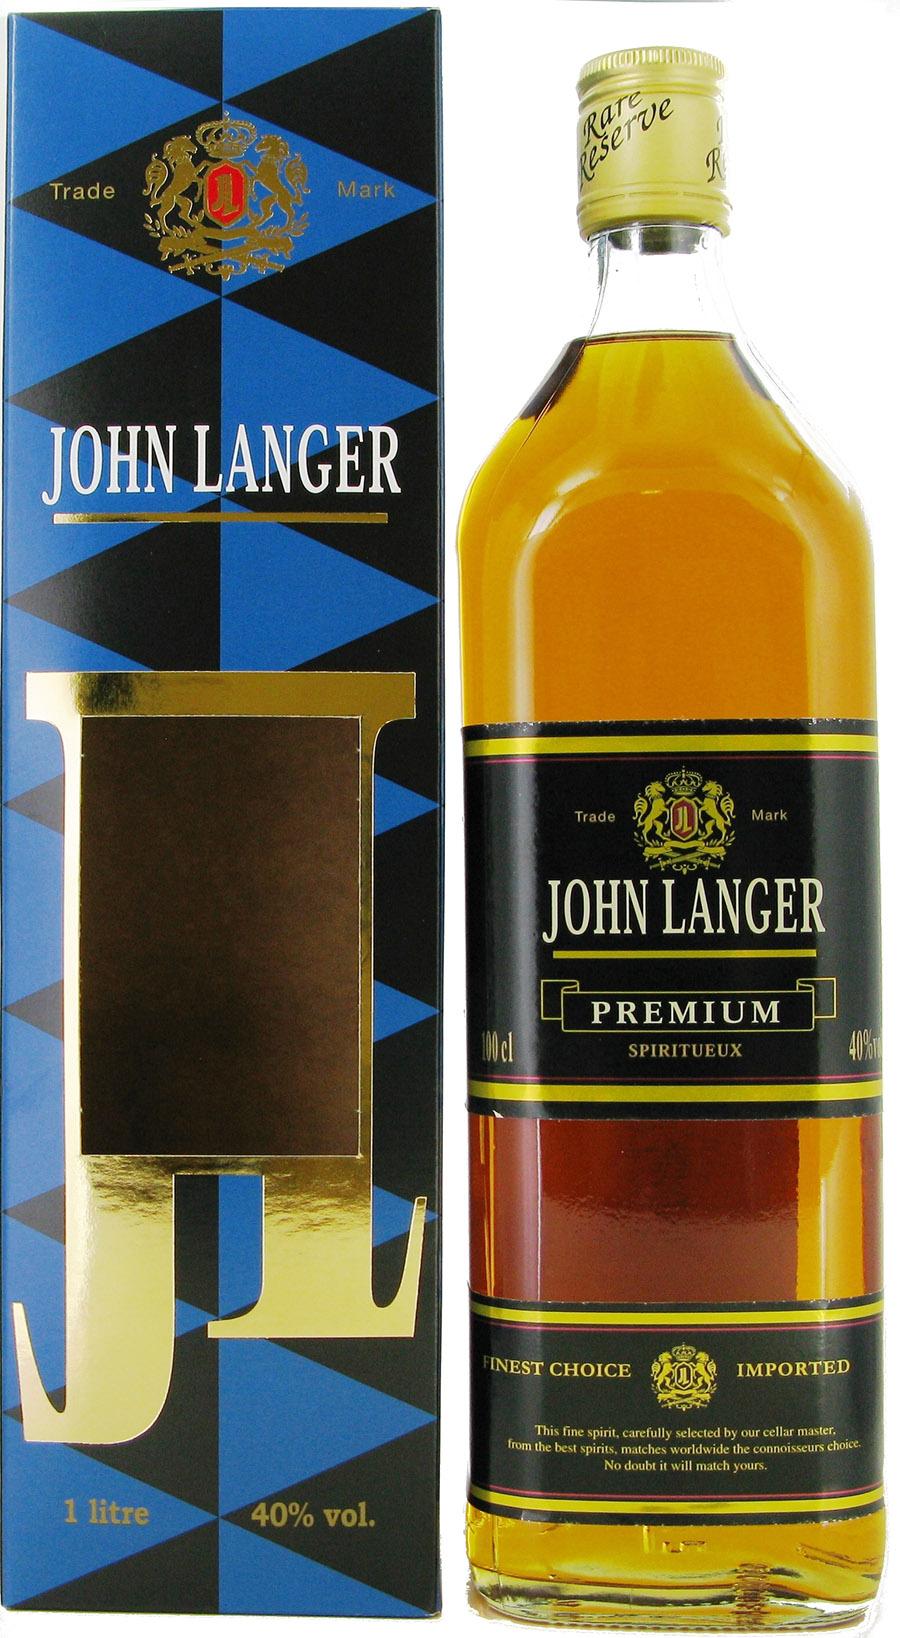 SPIRIT JOHN LANGER BLACK 40 % - 1 L + COFFRET